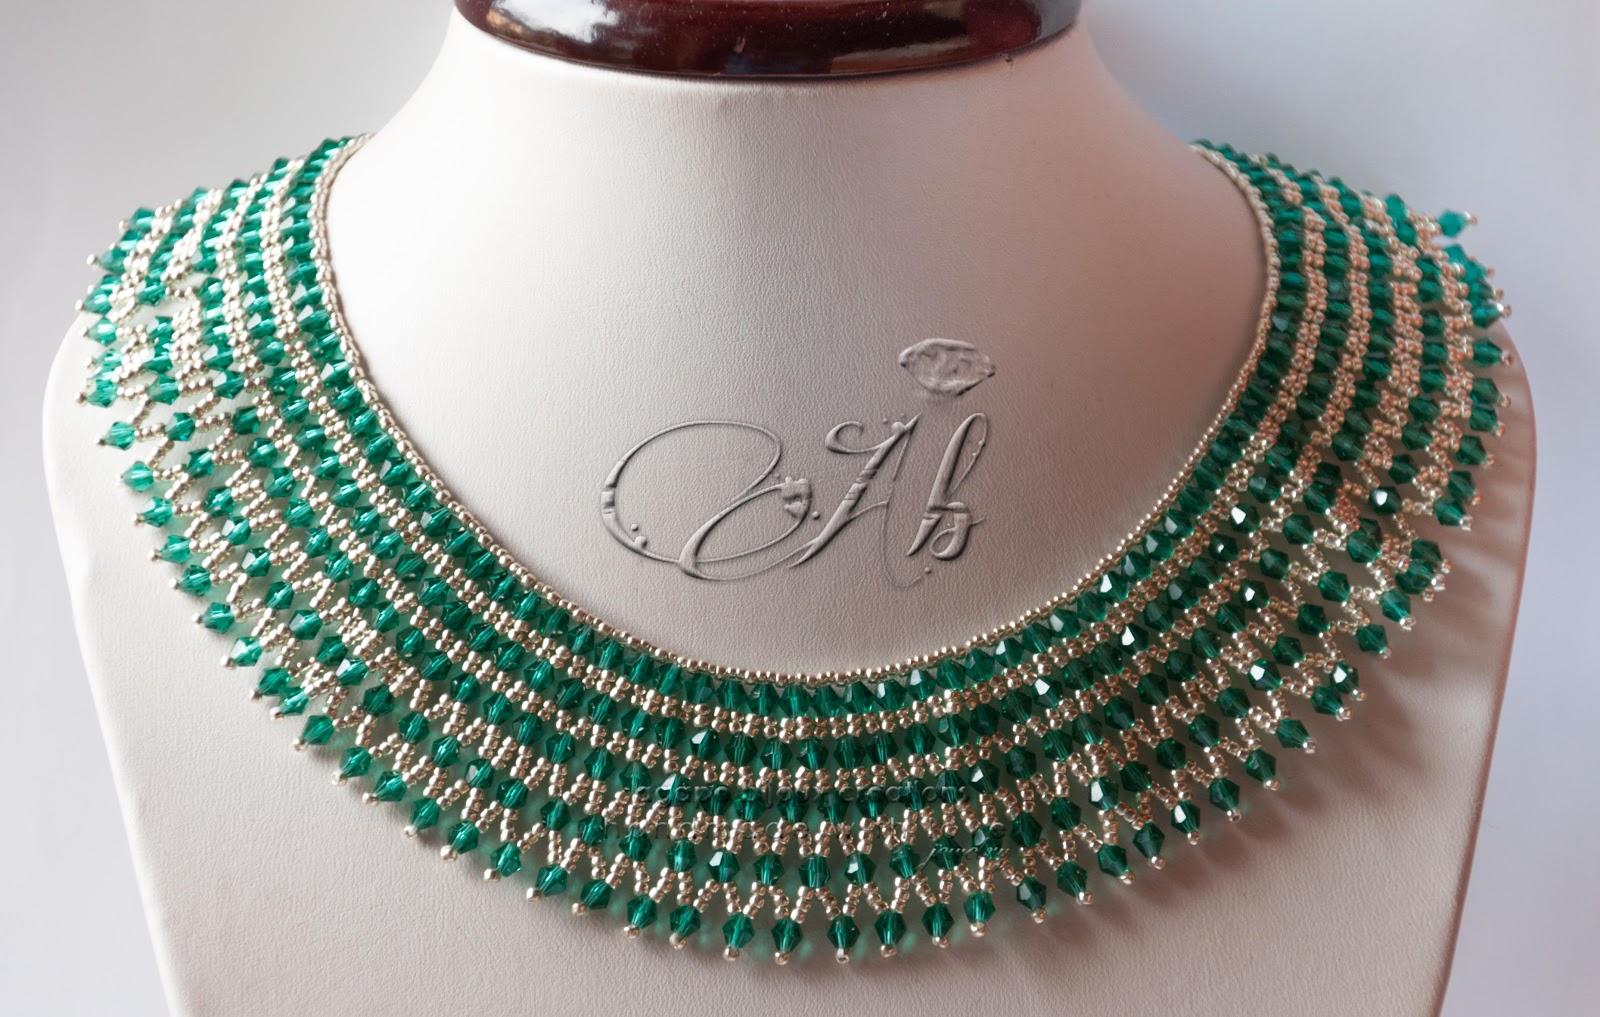 Popolare Collana Verde Smeraldo UV47 » Regardsdefemmes CI51